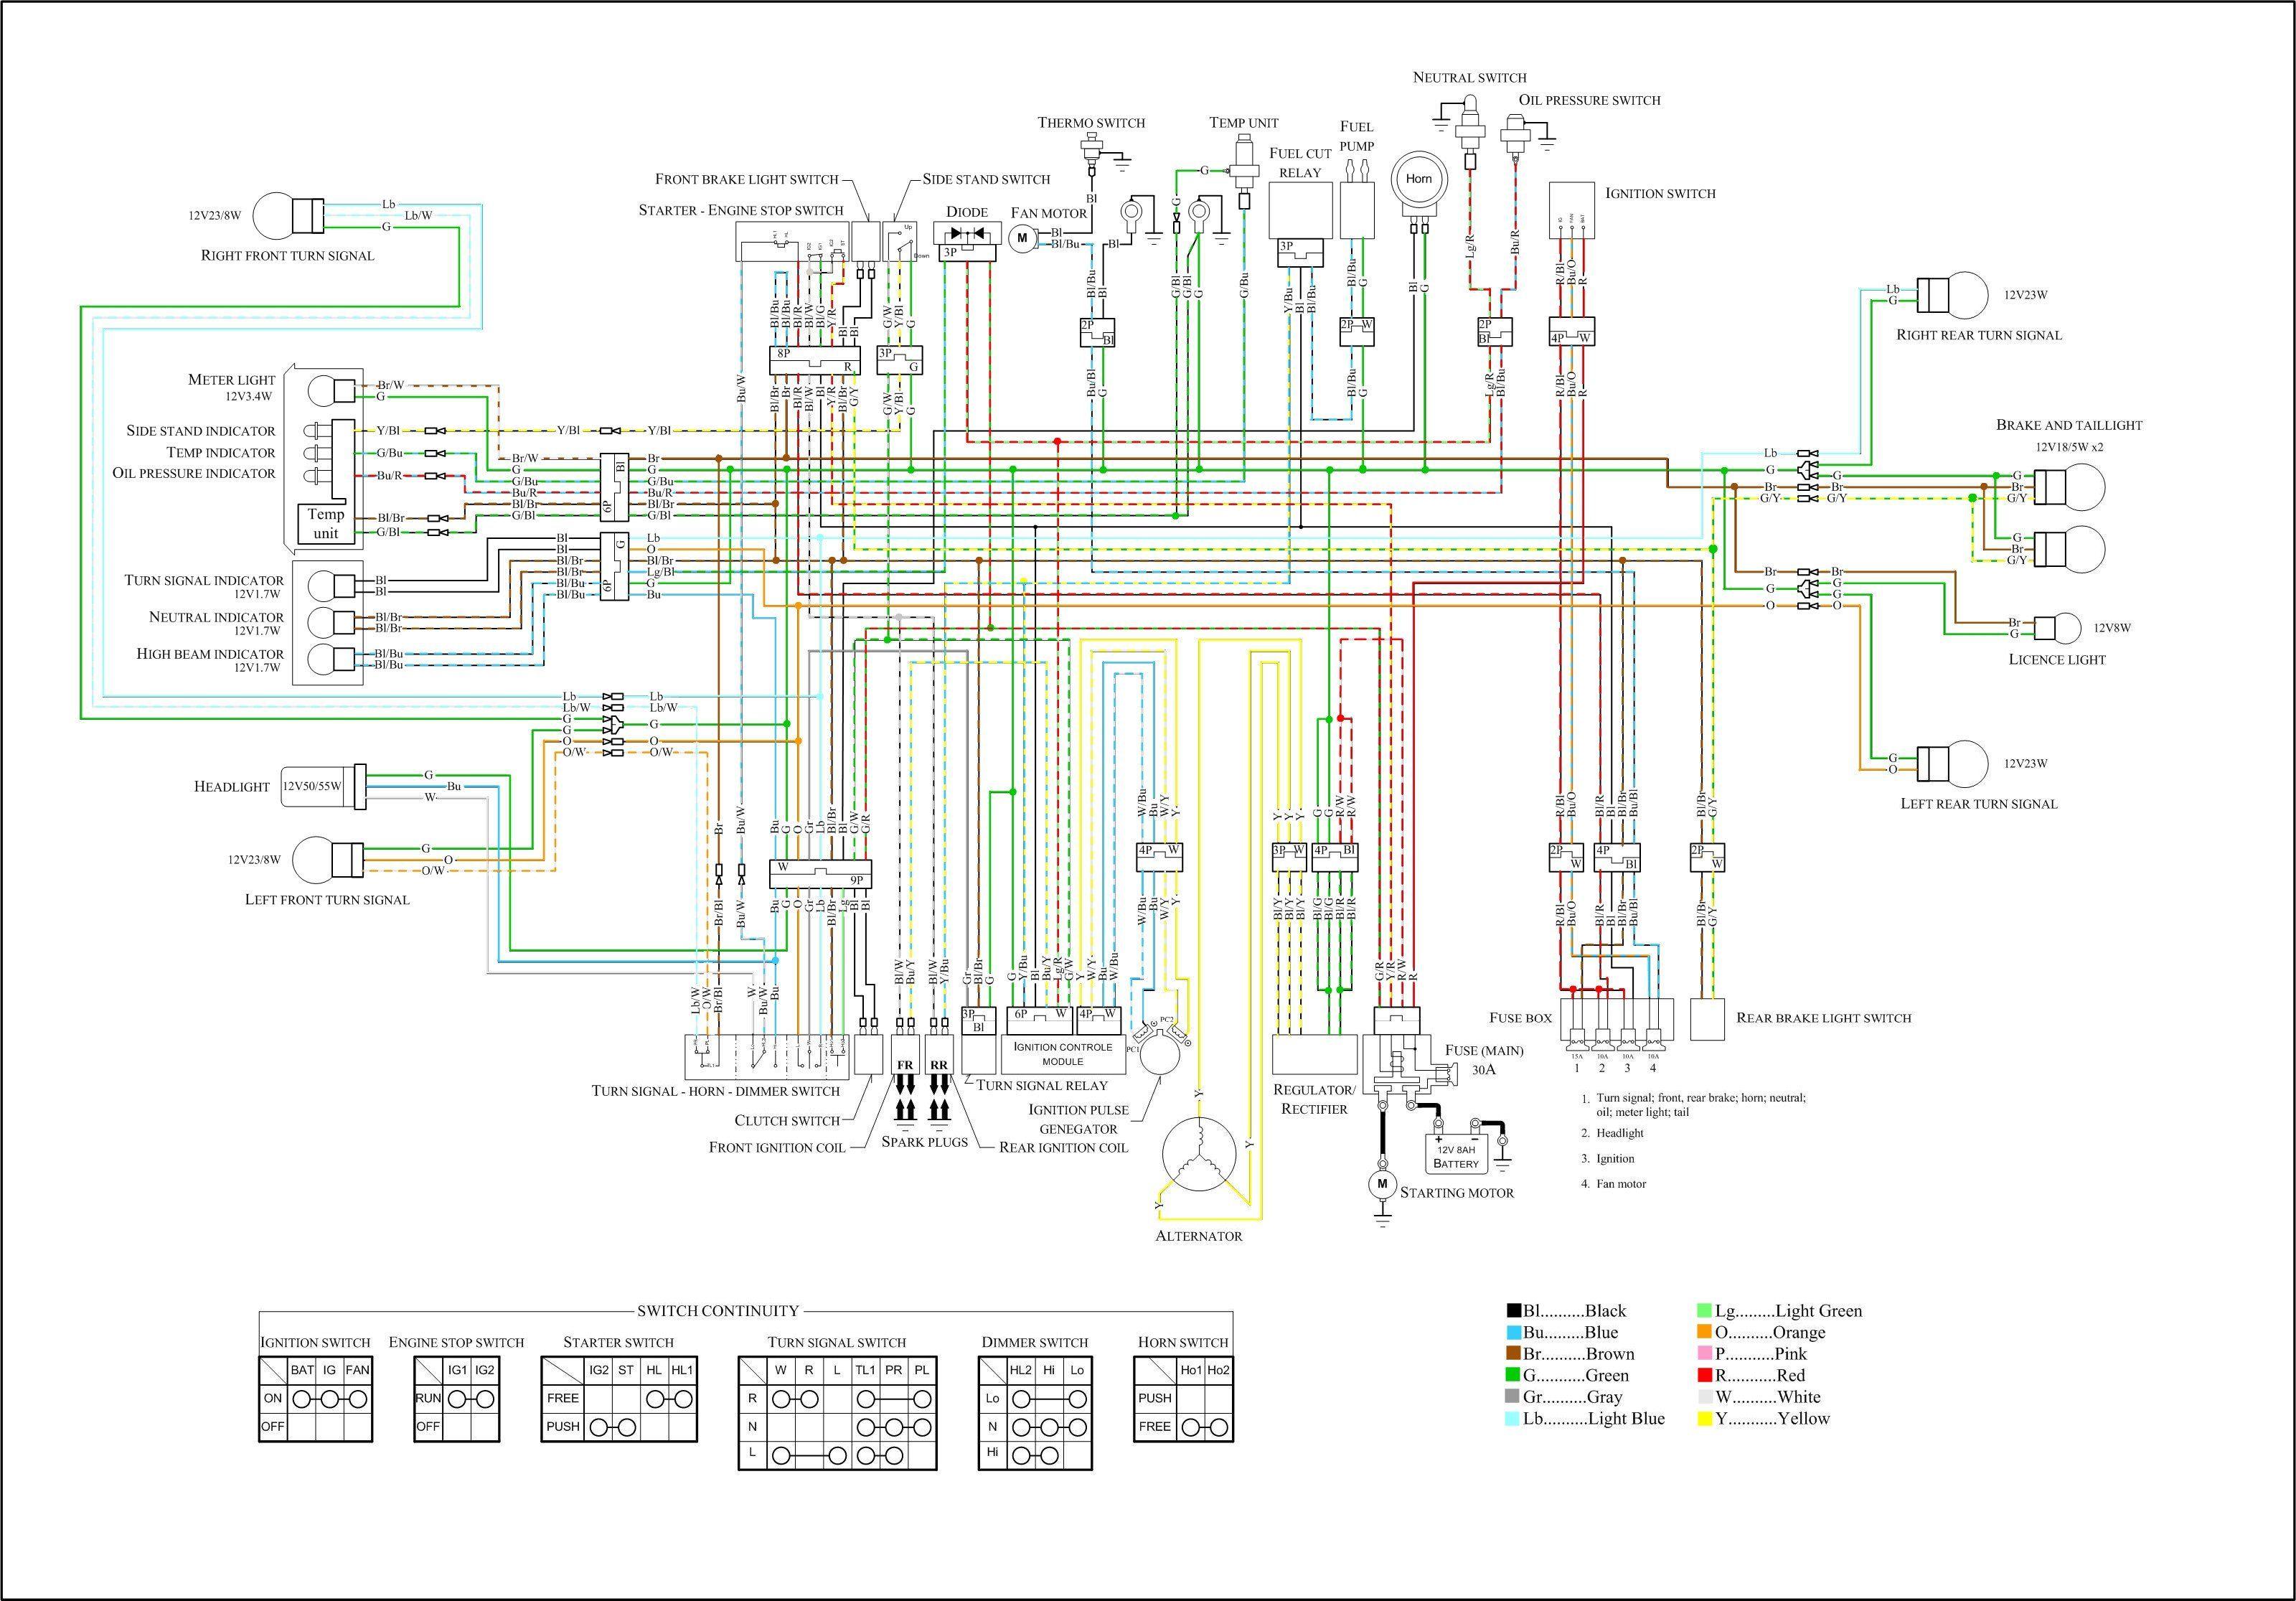 97 honda motorcycle wiring diagram 97 honda civic wiring diagram  97 honda civic wiring diagram